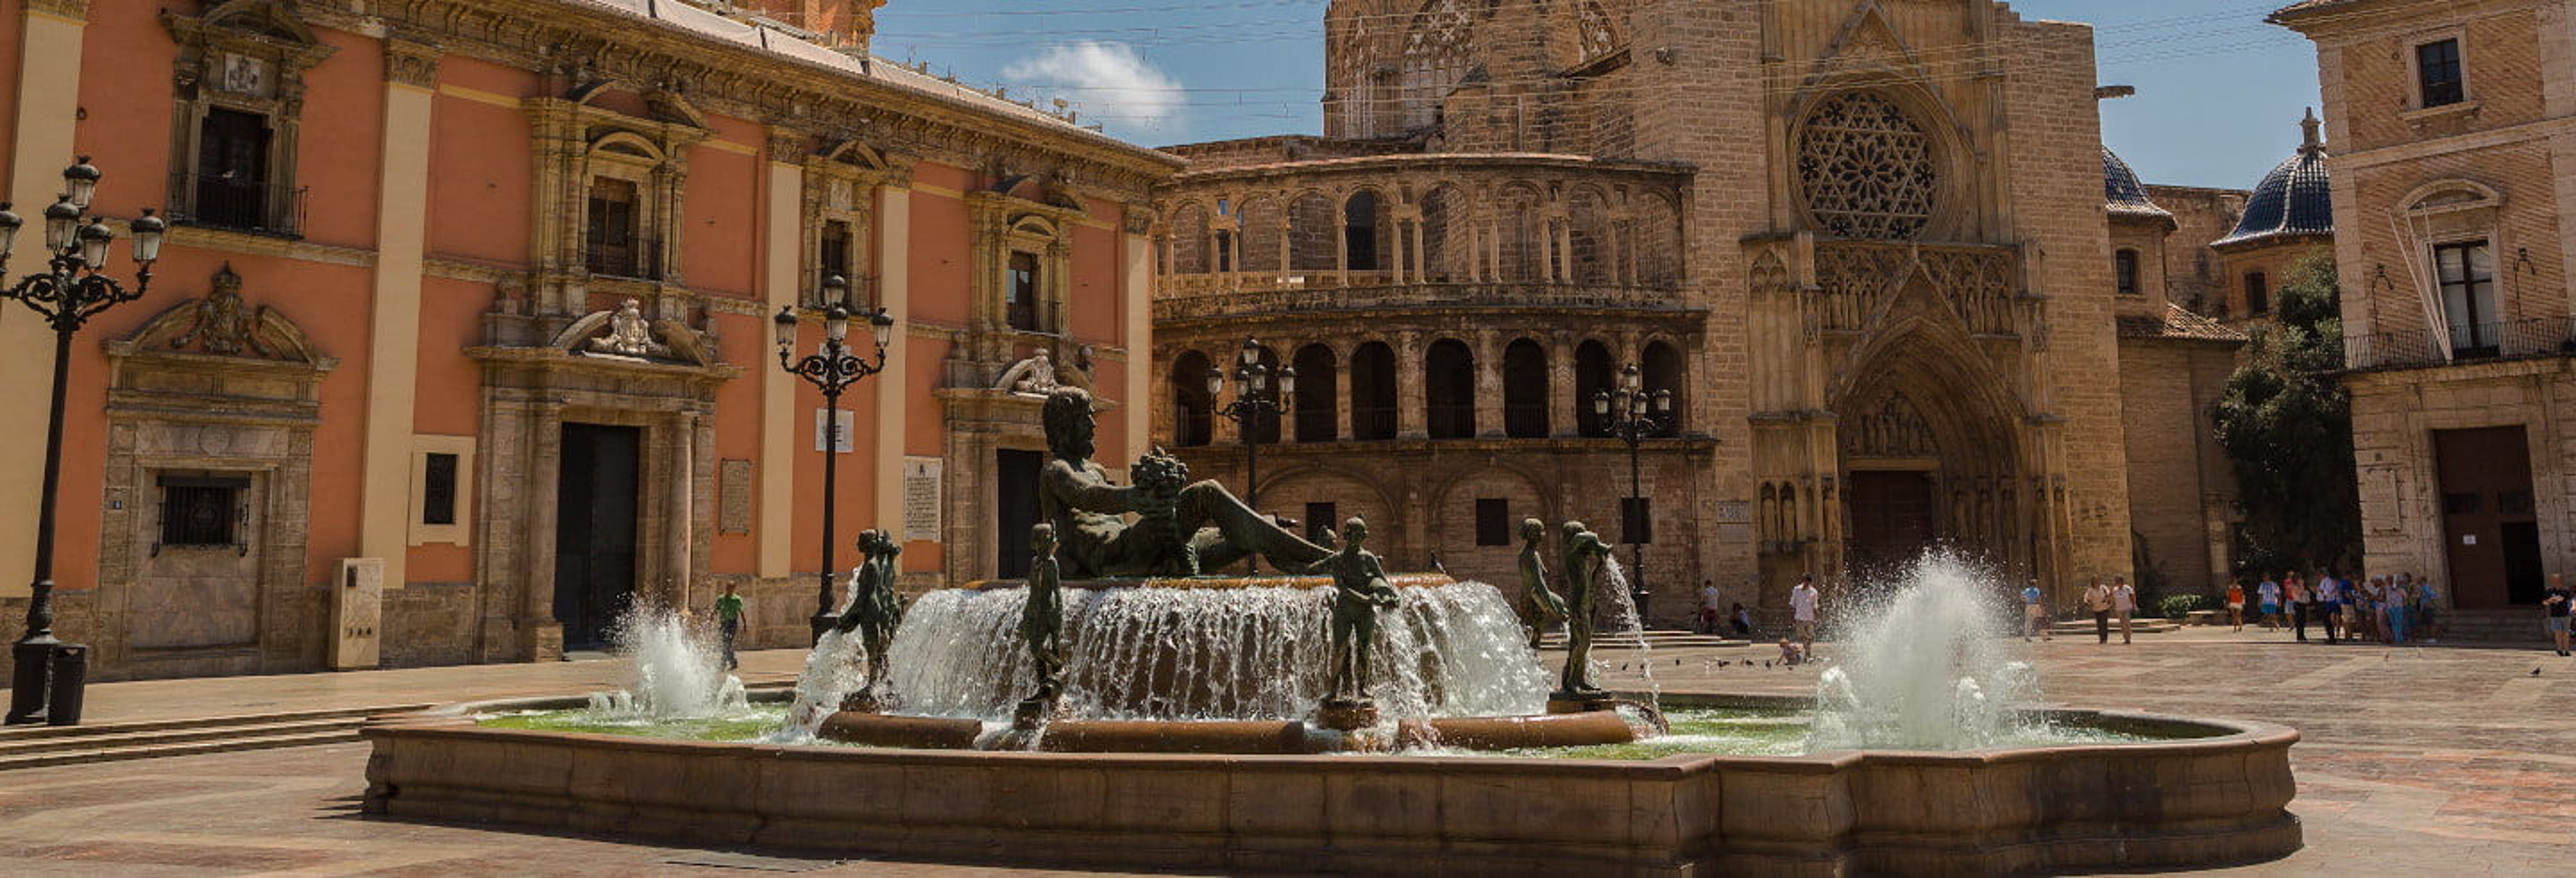 Valencia Day Trip